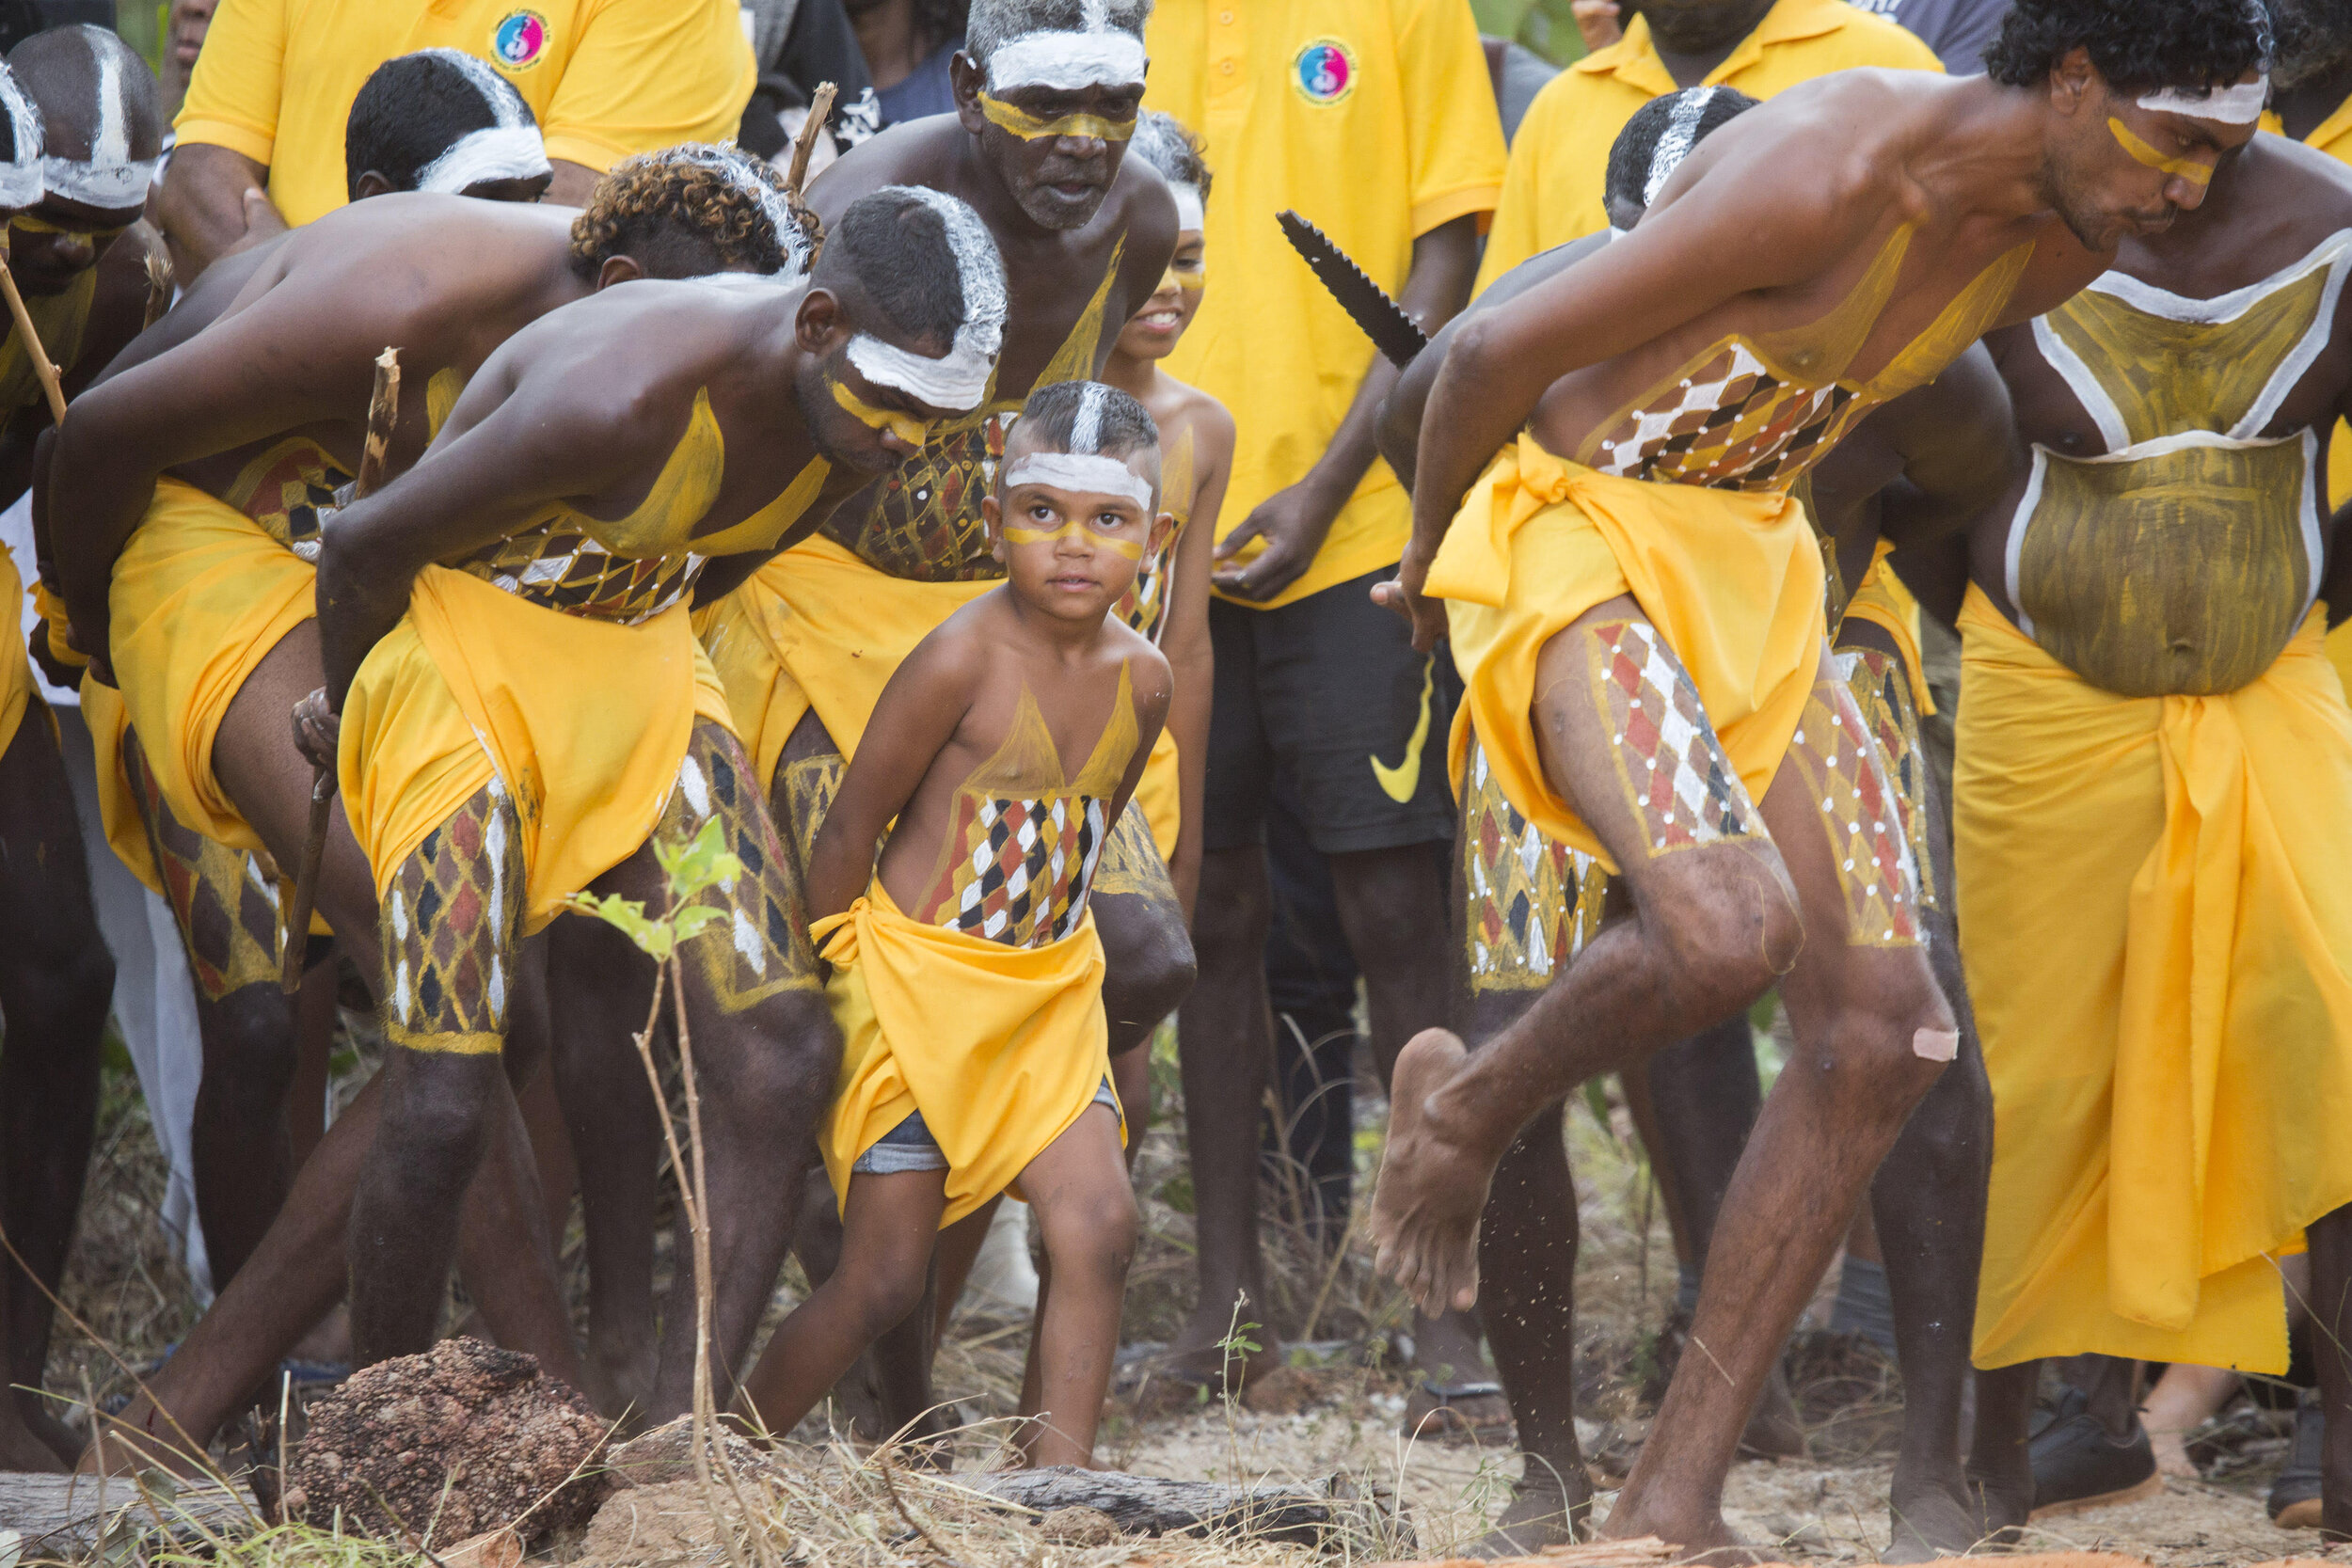 AUSTRALIA  THE GARMA FESTIVAL, (ARNHEM LAND)   THE GARMA FESTIVAL  is an annual 4-day celebration of Yolngu culture held in northeast Arnhem Land, showcasing ancient story-telling and traditional miny'tji (art), manikay (song), and bunggul (dance)   Photo: Members of the Gumatj clan performing bunggul (traditional dance) at the opening of the Garma Festival.  © Melanie Faith Dove / Yothu Yindi Foundation.